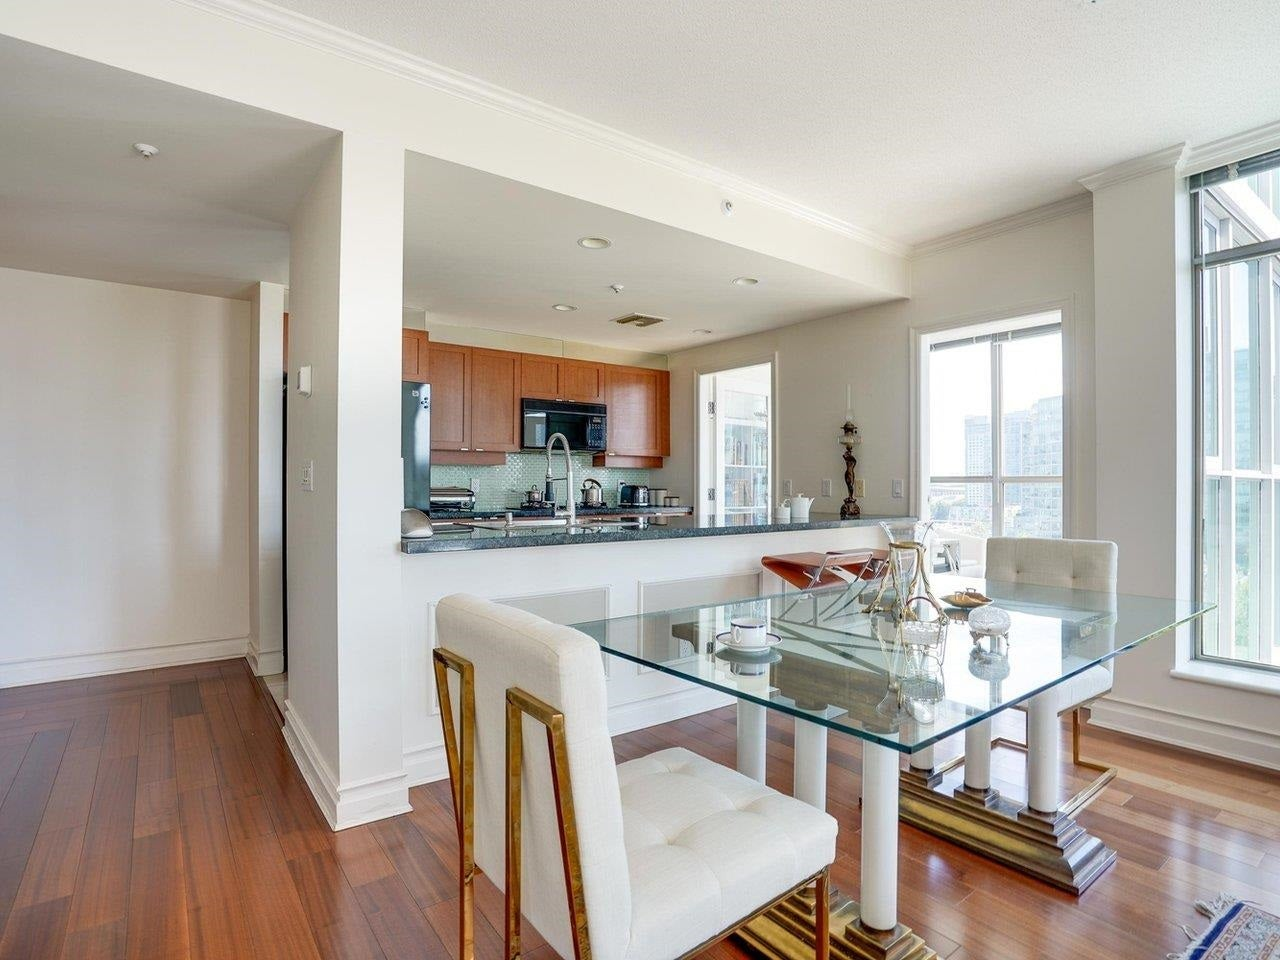 1003 1790 BAYSHORE DRIVE - Coal Harbour Apartment/Condo for sale, 1 Bedroom (R2606481) - #4